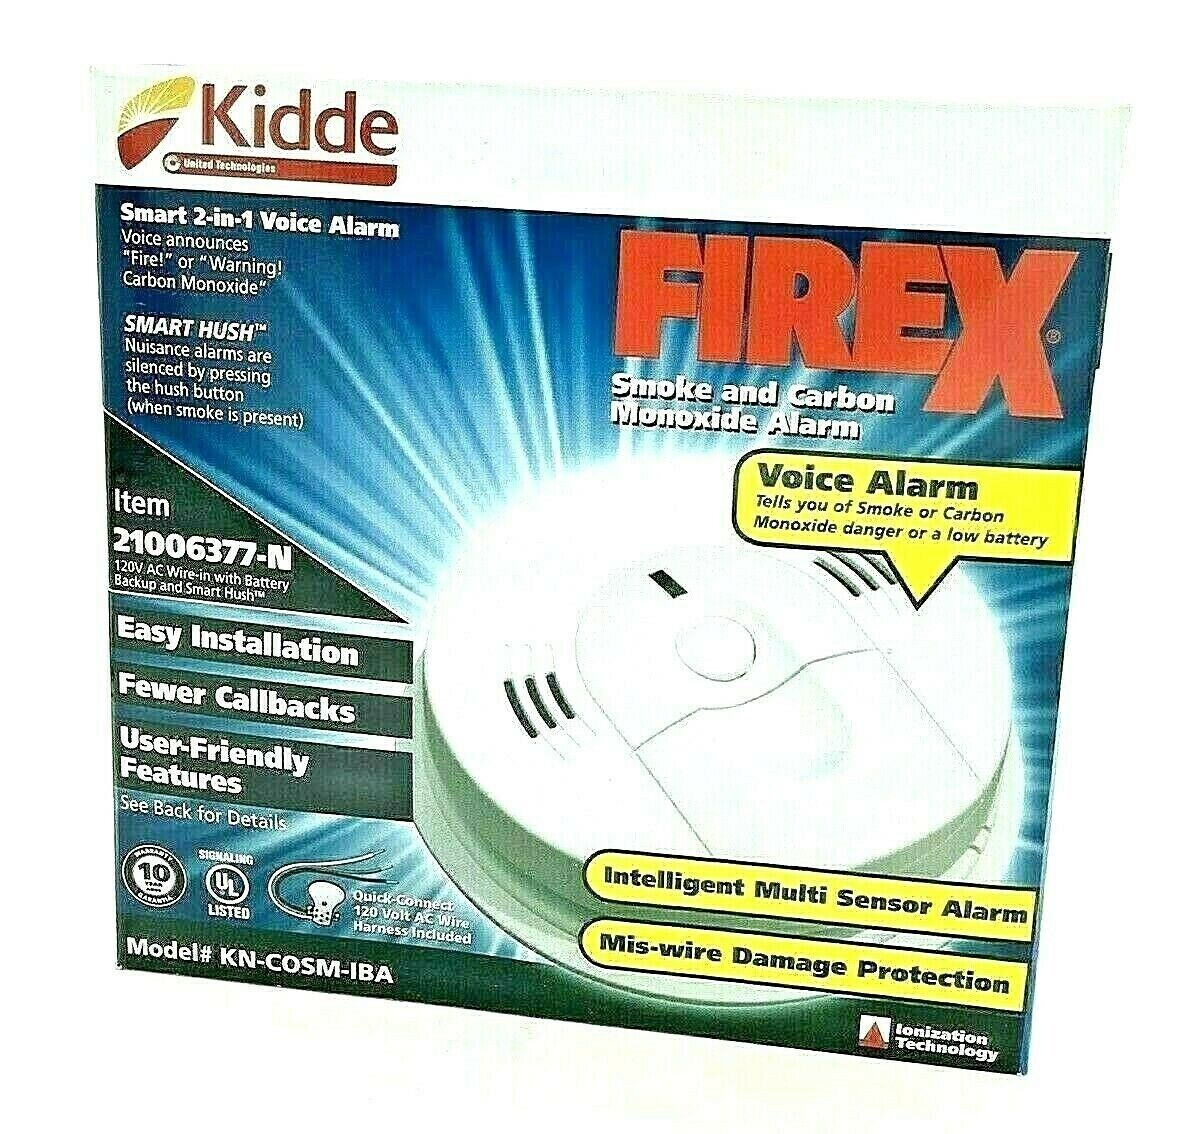 10X Kidde KN-COSM-IBA Hardwire FIREX Combination Smoke/Carbon Monoxide Alarm